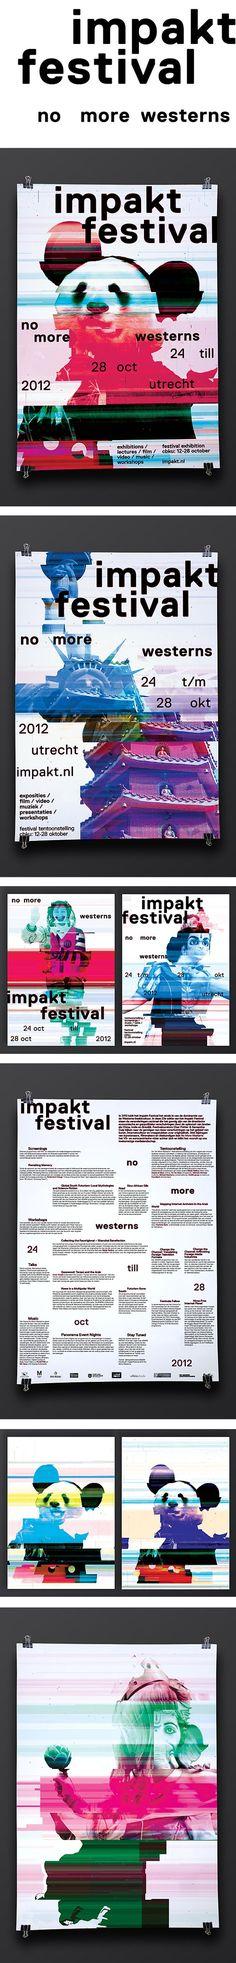 Poster, Print, Impakt Festival by Lava Graphic Design, Amsterdam, NL - Poster Design, Graphic Design Posters, Graphic Design Typography, Graphic Design Illustration, Graphic Design Inspiration, Print Design, Creative Inspiration, Design Graphique, Art Graphique